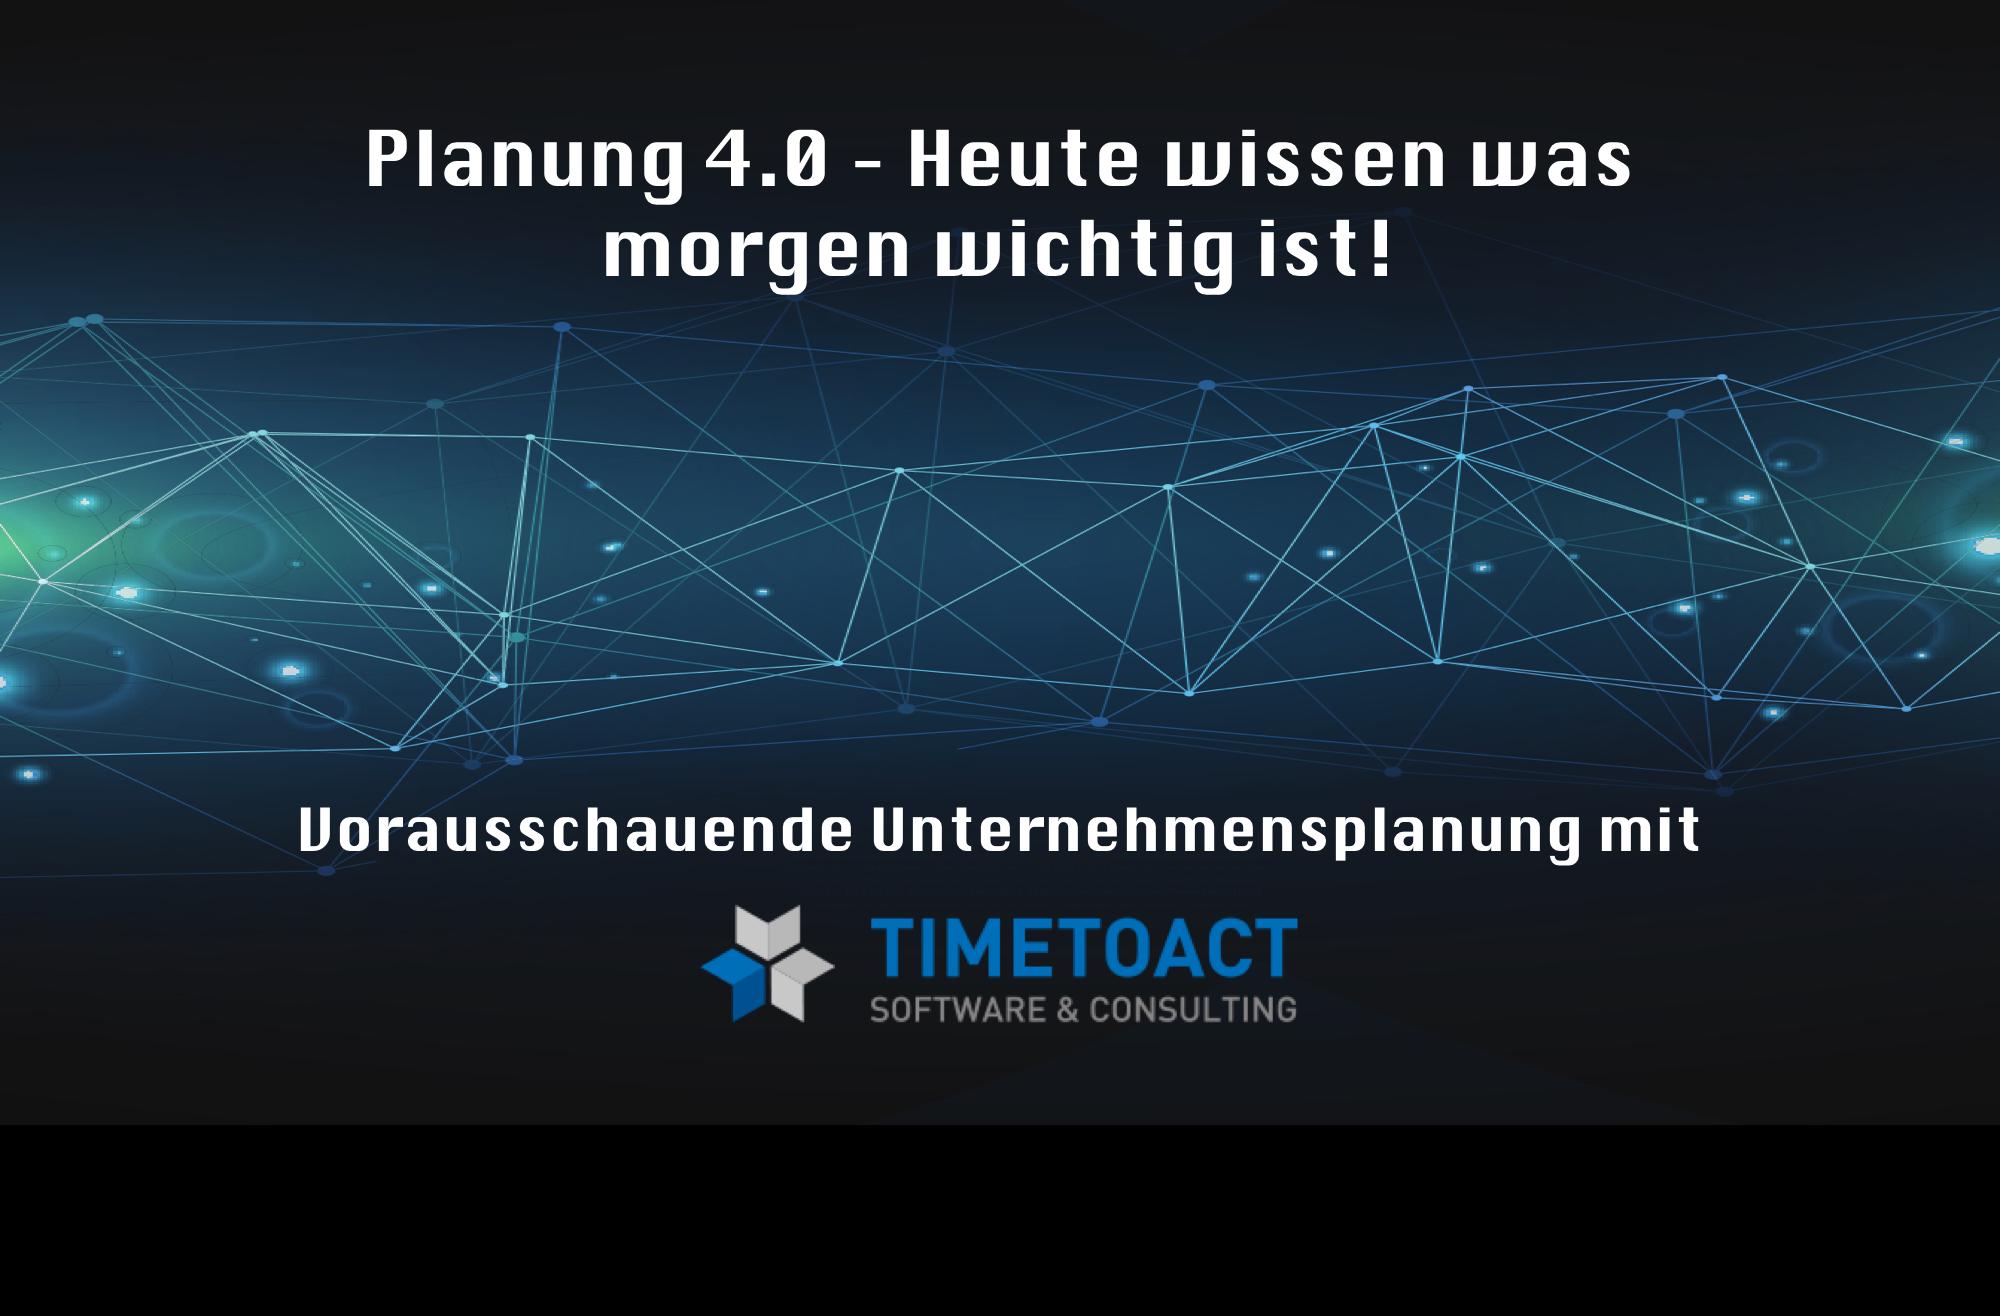 Planung 4.0Titelbild